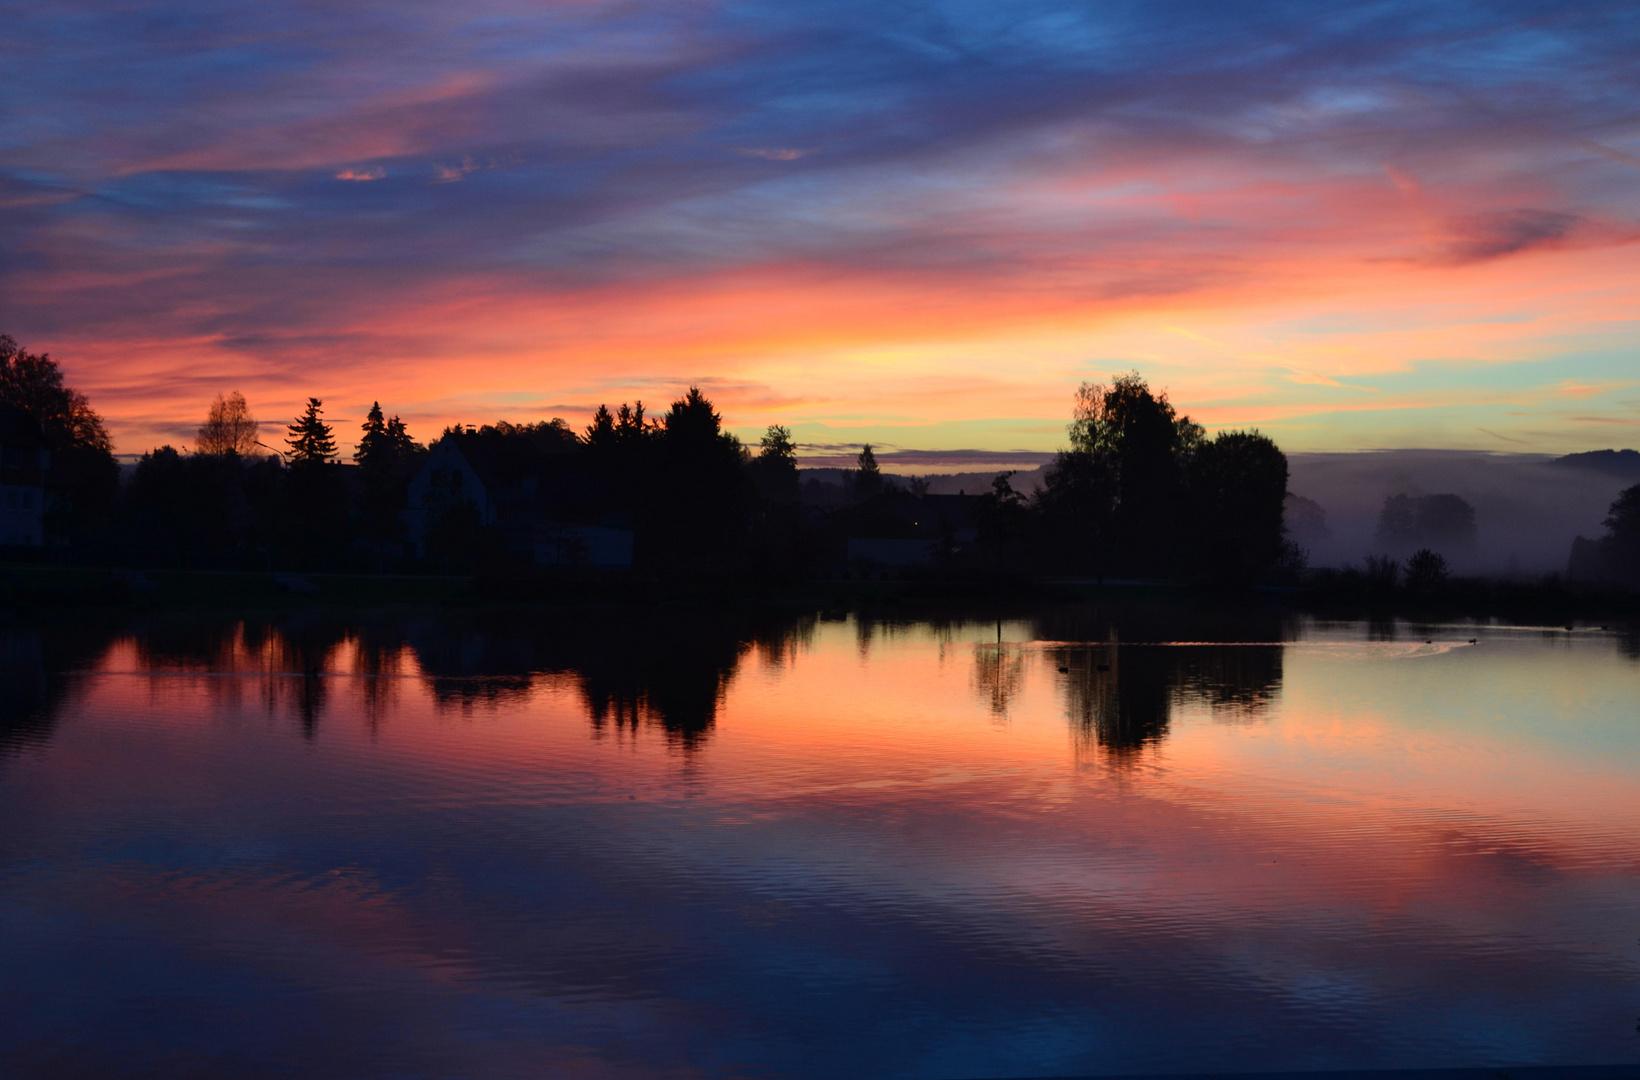 Sonnenaufgang 1 - 9. Oktober 2014